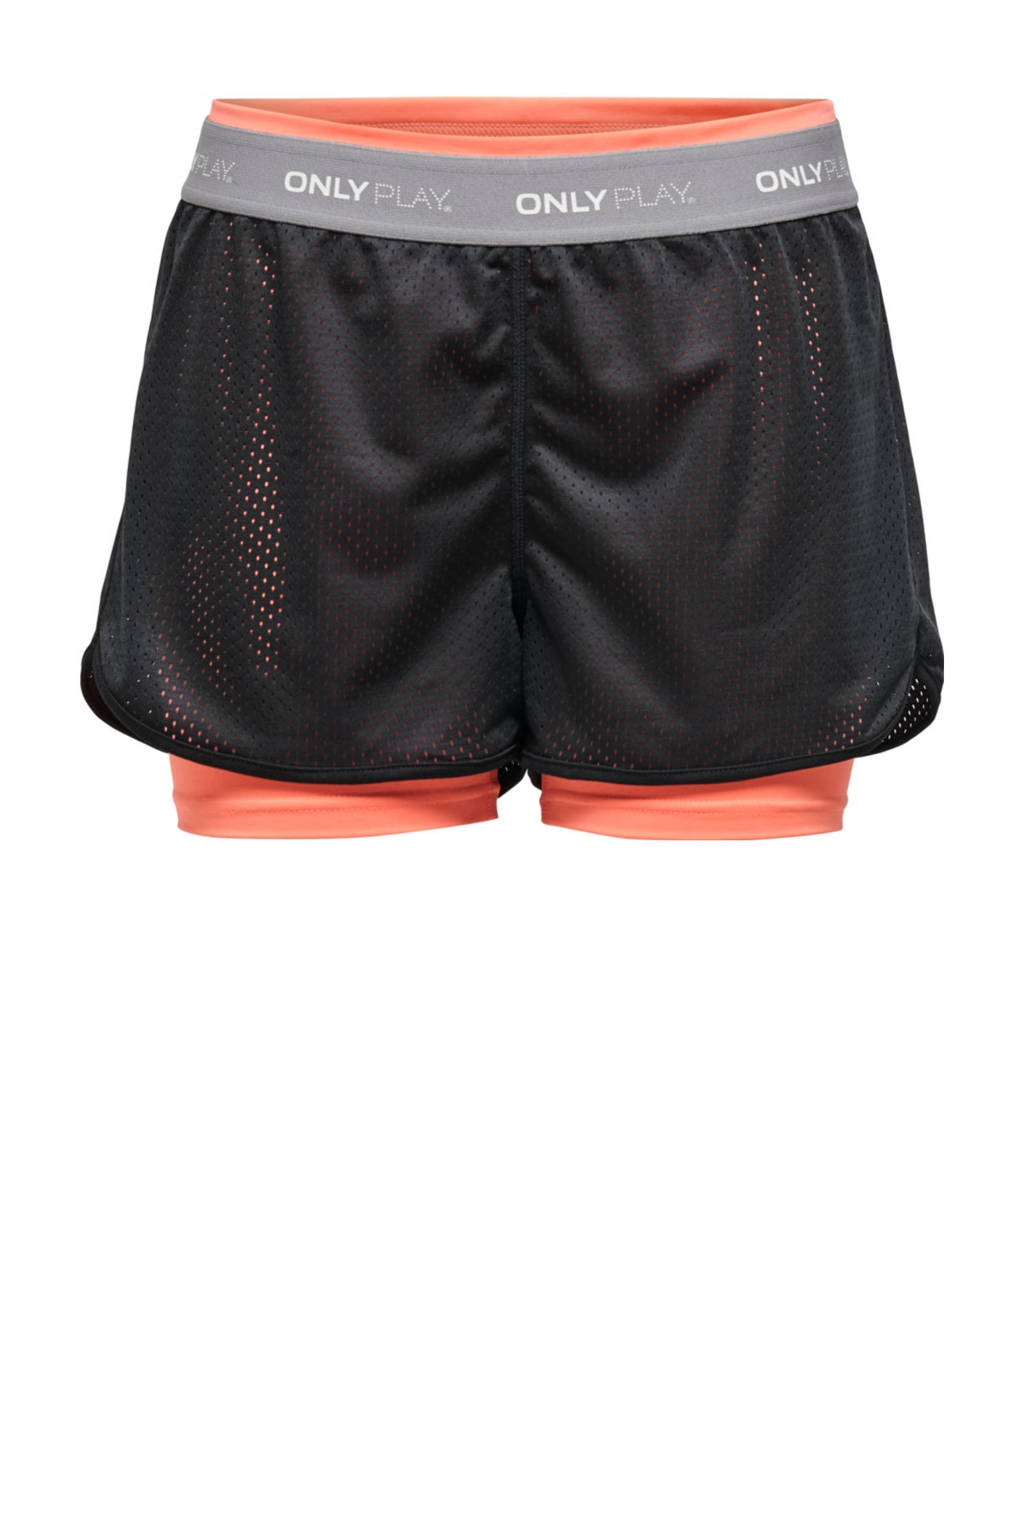 ONLY PLAY sportshort Malia zwart/neon oranje, Zwart/neon oranje